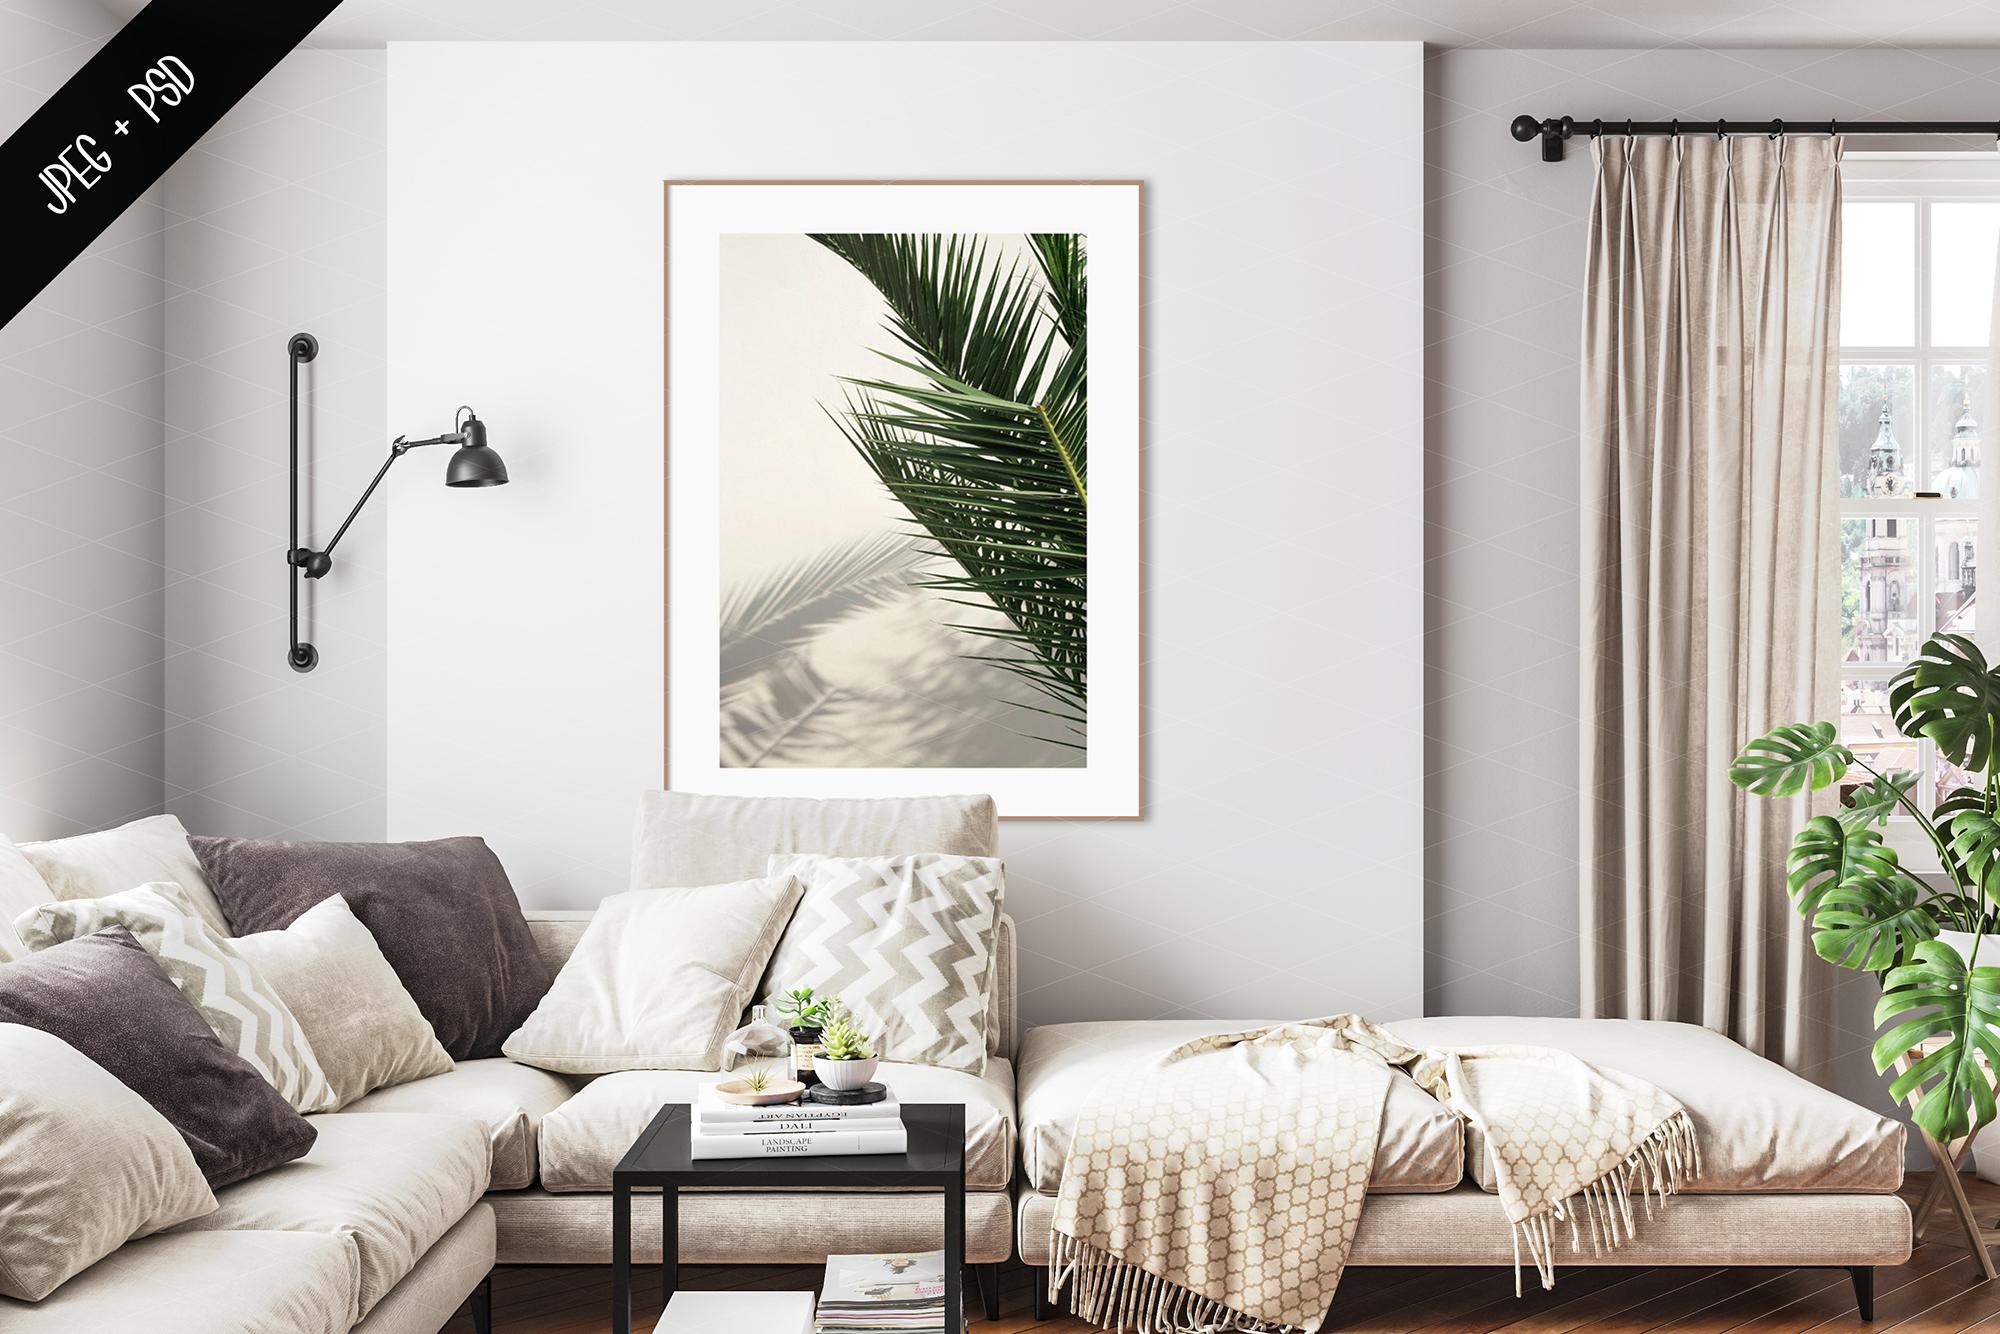 Interior mockup BUNDLE - frame & wall mockup creator example image 14